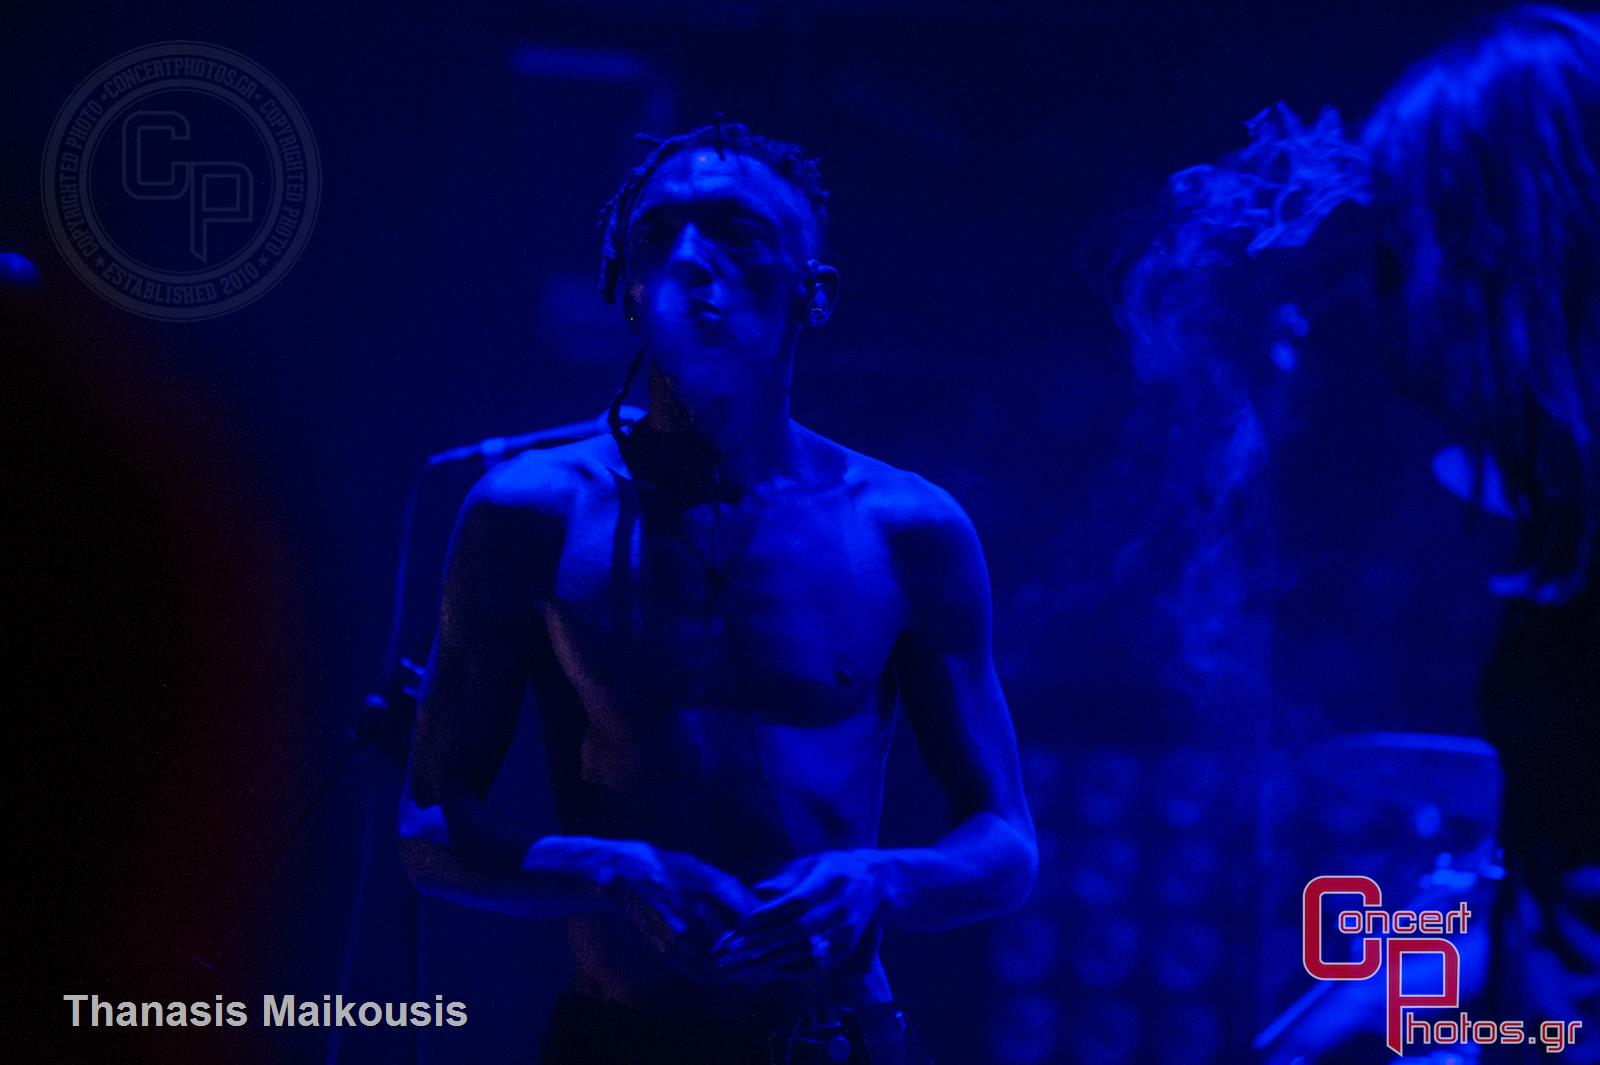 Tricky - Spectralfire-Tricky - Spectralfire photographer: Thanasis Maikousis - concertphotos_-3852